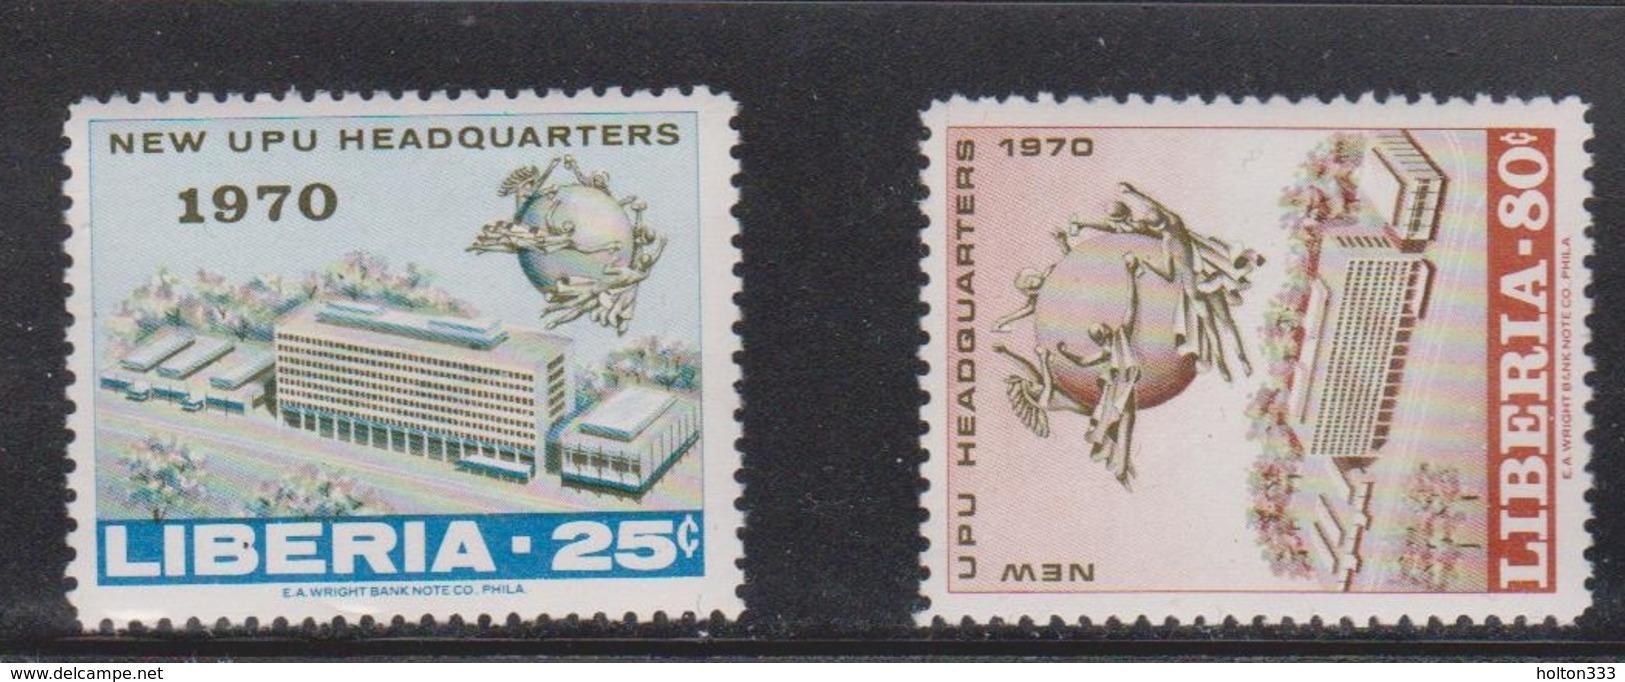 LIBERIA Scott # 523-4 Mint Hinged - New UPU Headquarters - Liberia